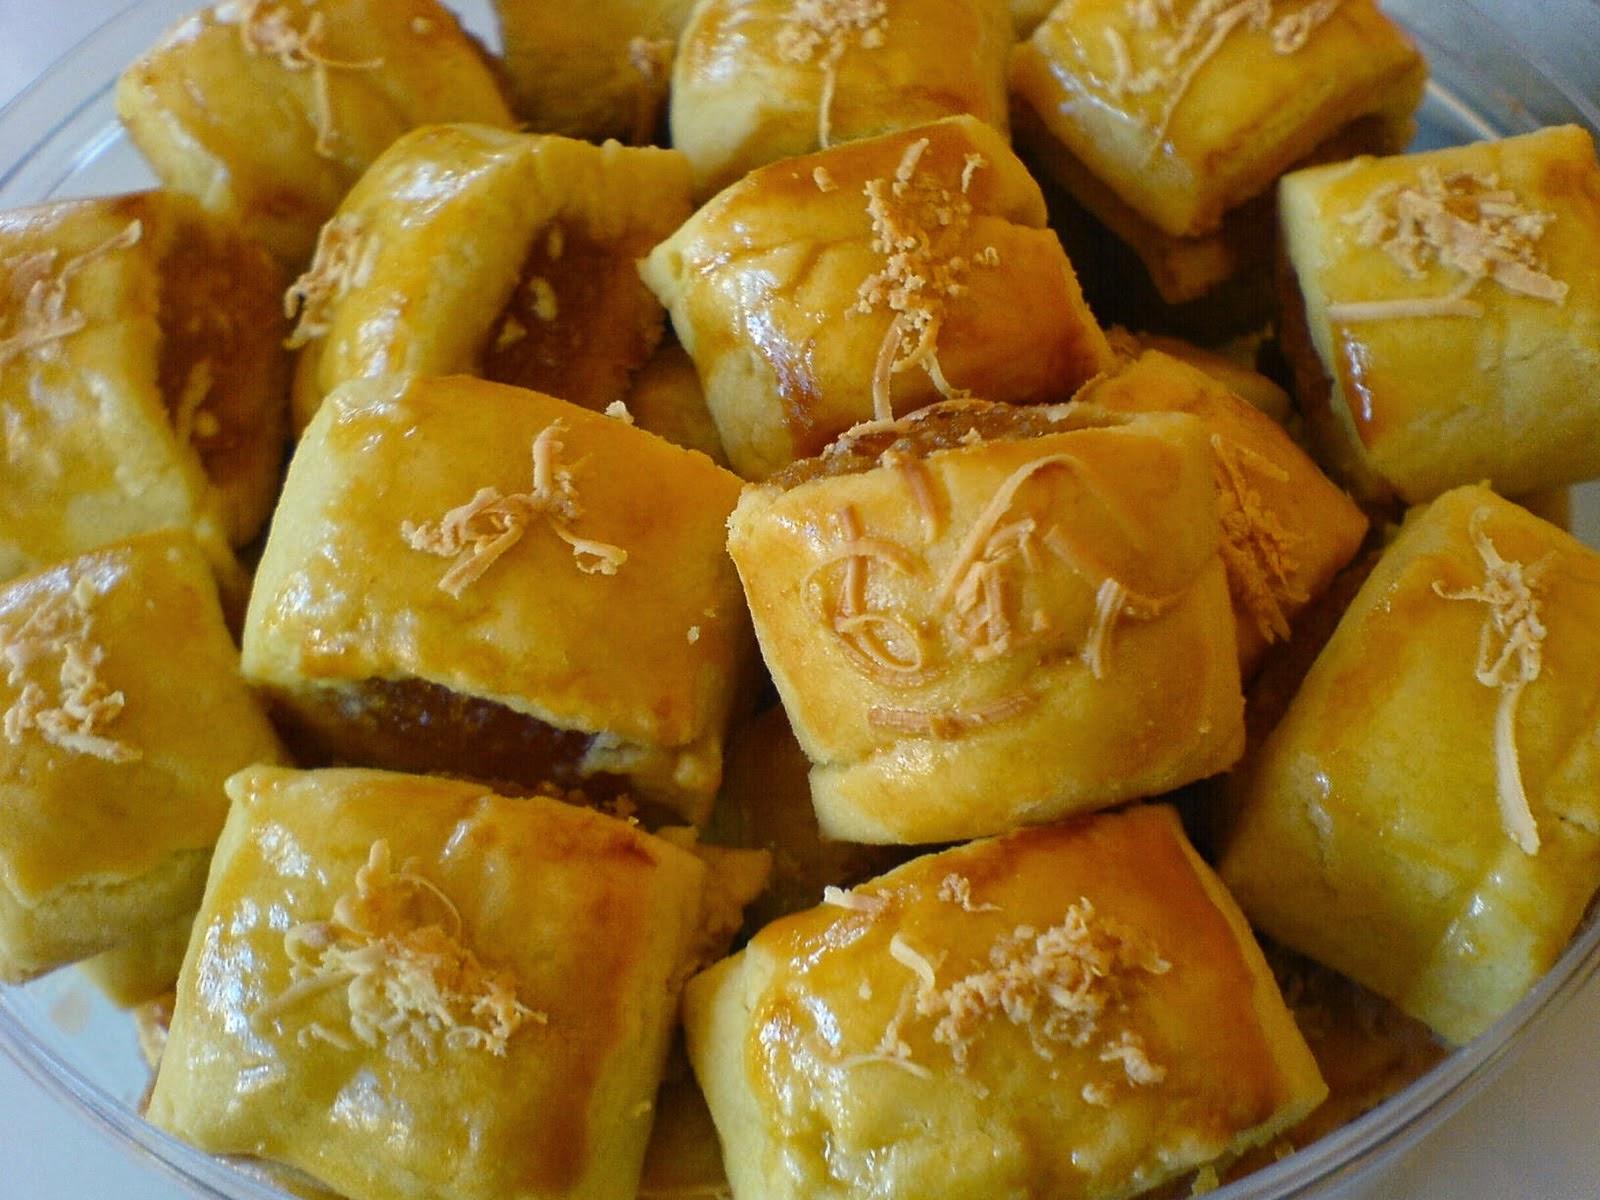 resep kue kering lebaran nastar keju selai nanas spesial